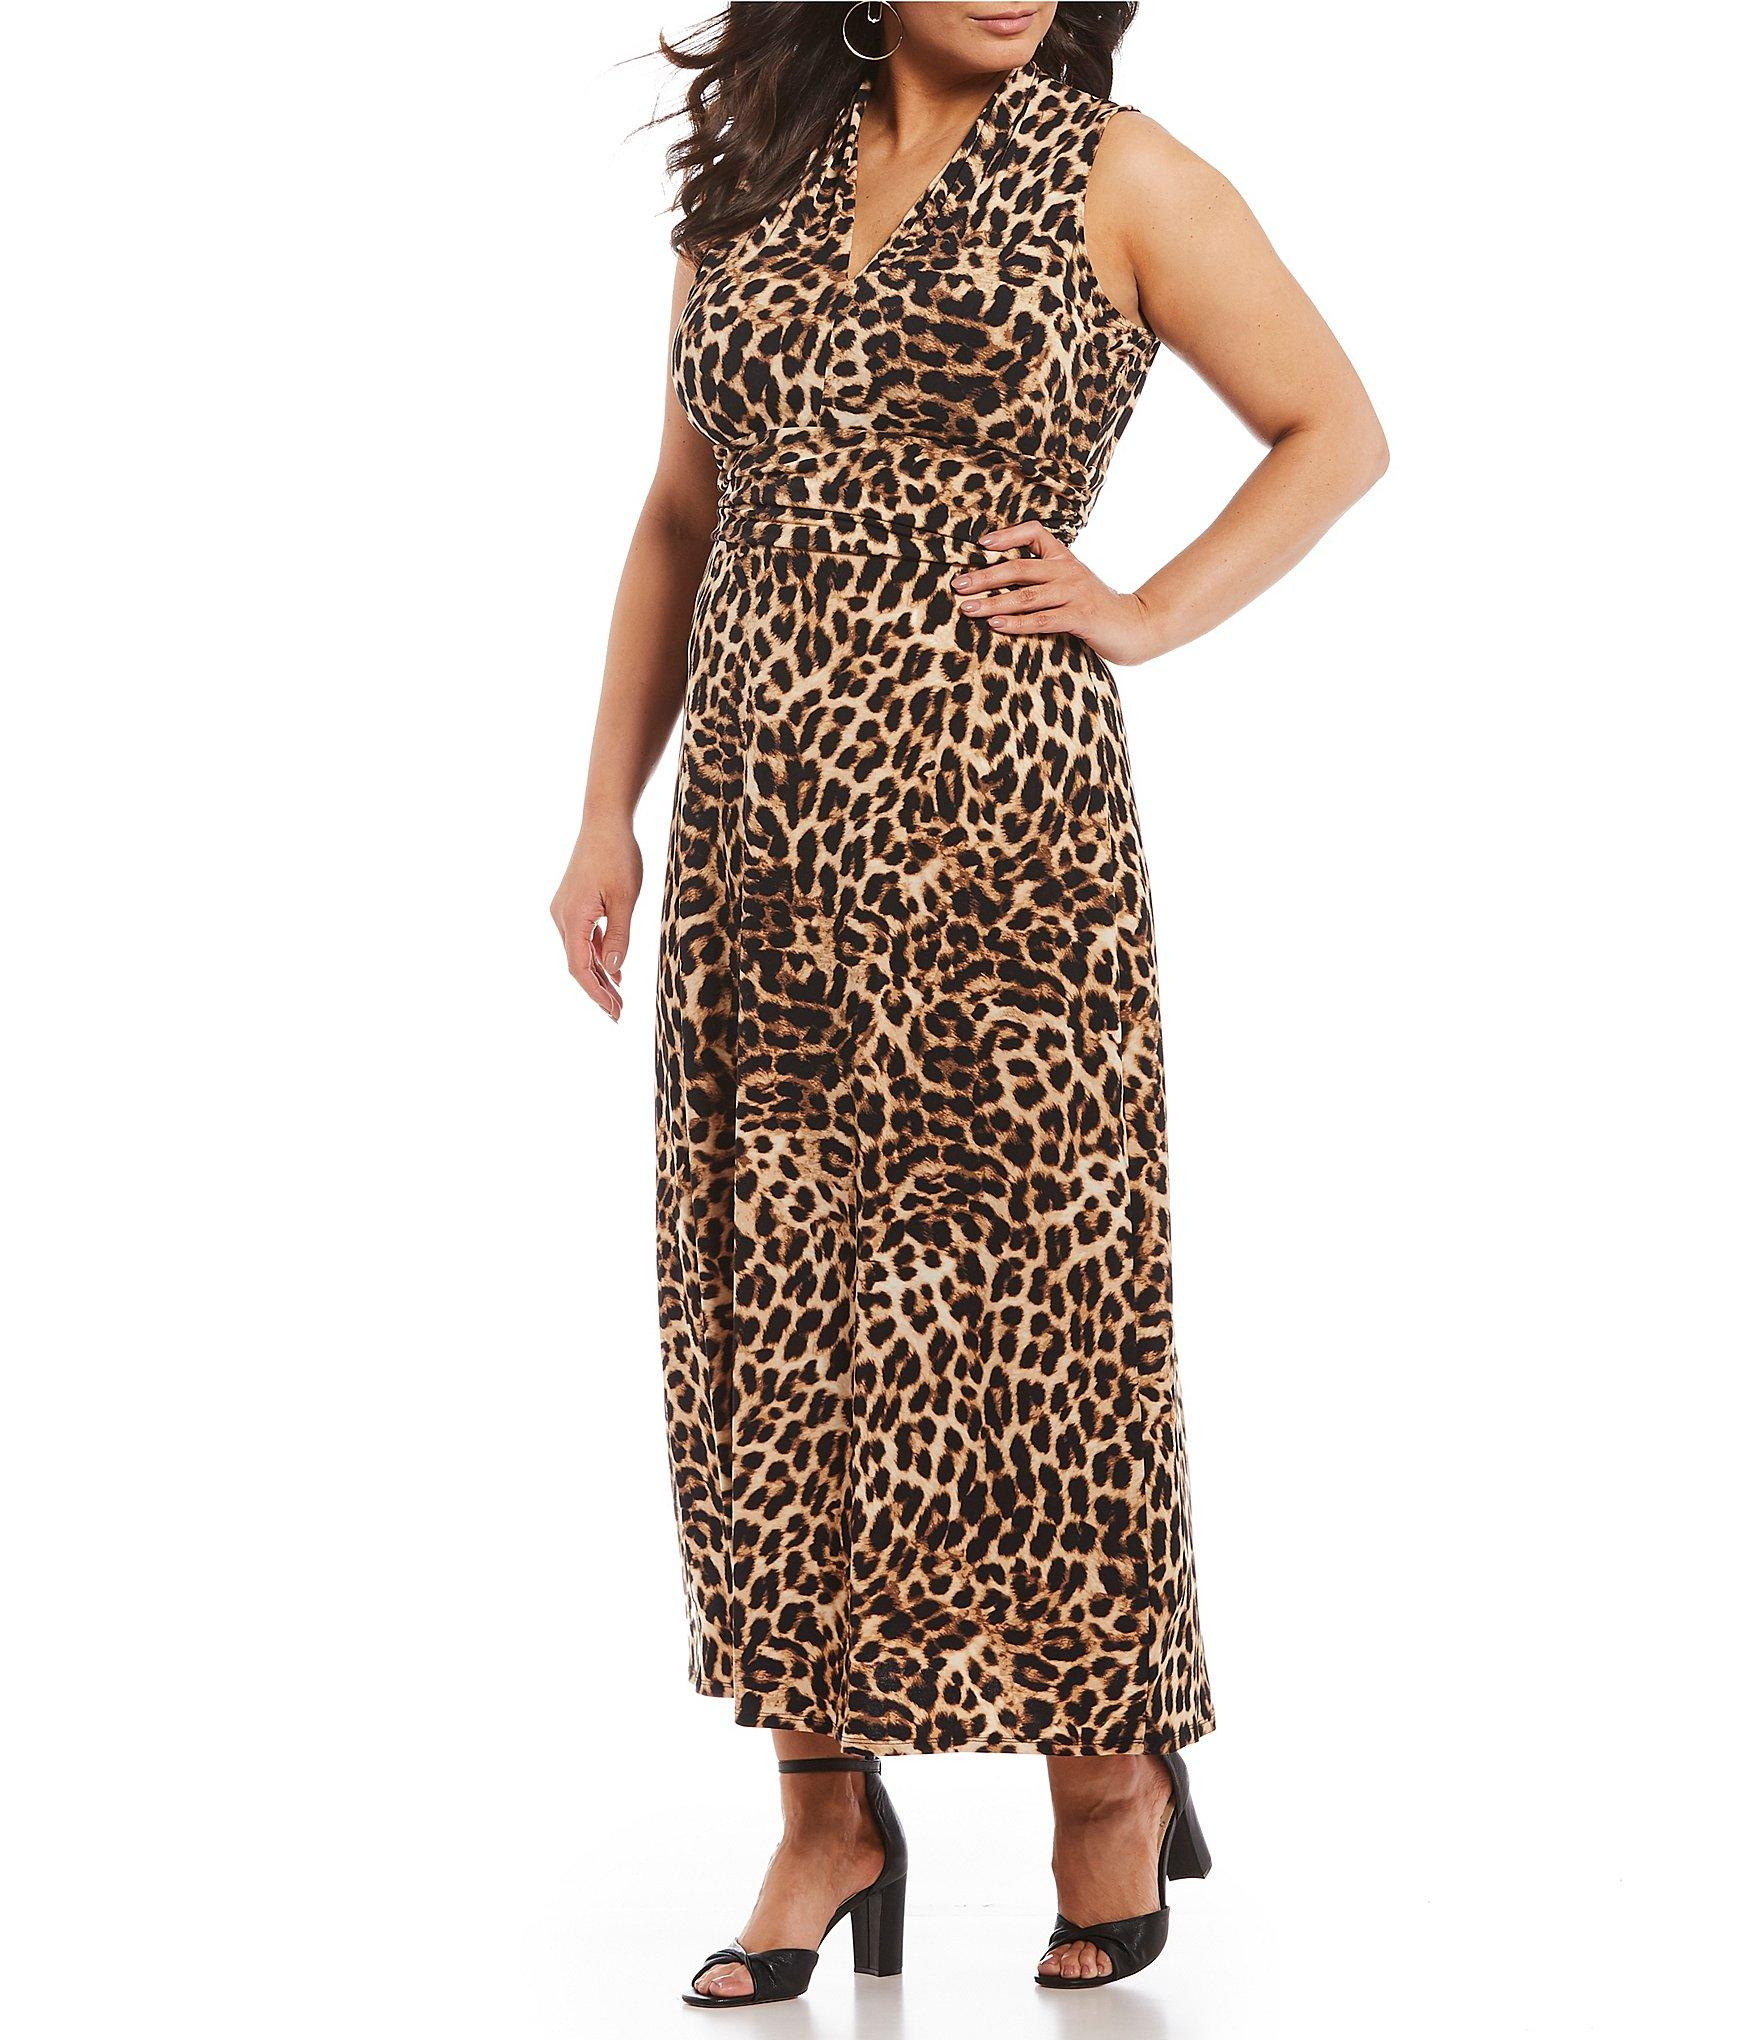 9280150c5f7 Vince Camuto. Women s Black Plus Size Sleeveless Halter Leopard Maxi Dress